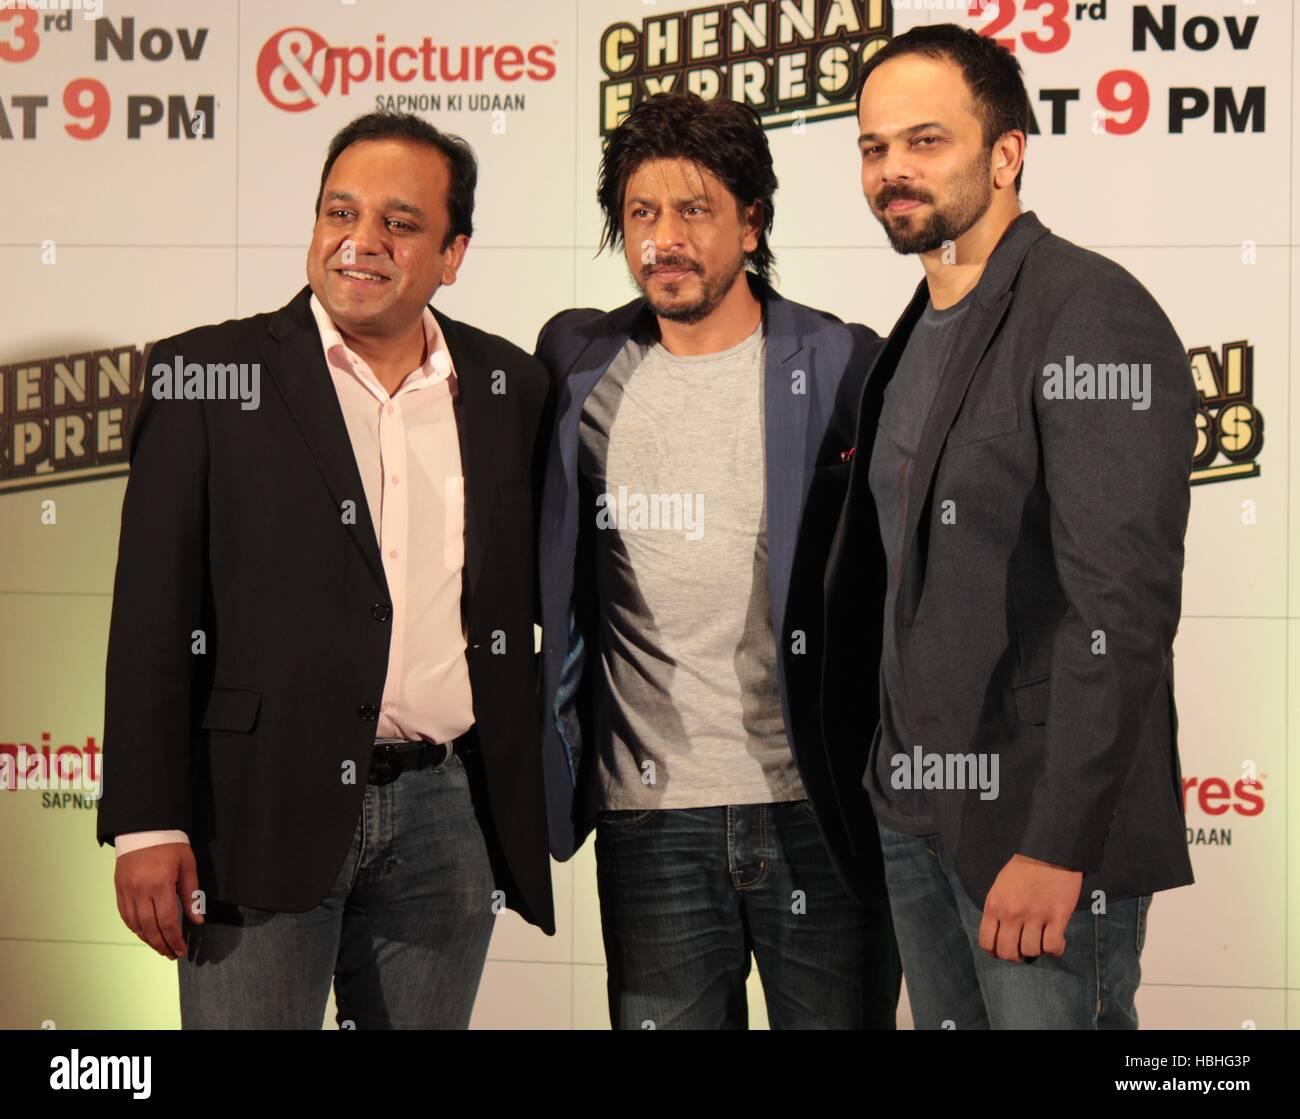 Punit Goenka Zee Entertainment Enterprises Limited Shah Rukh Khan Rohit Shetty Zee TV's party film Chennai Mumbai Photo Stock